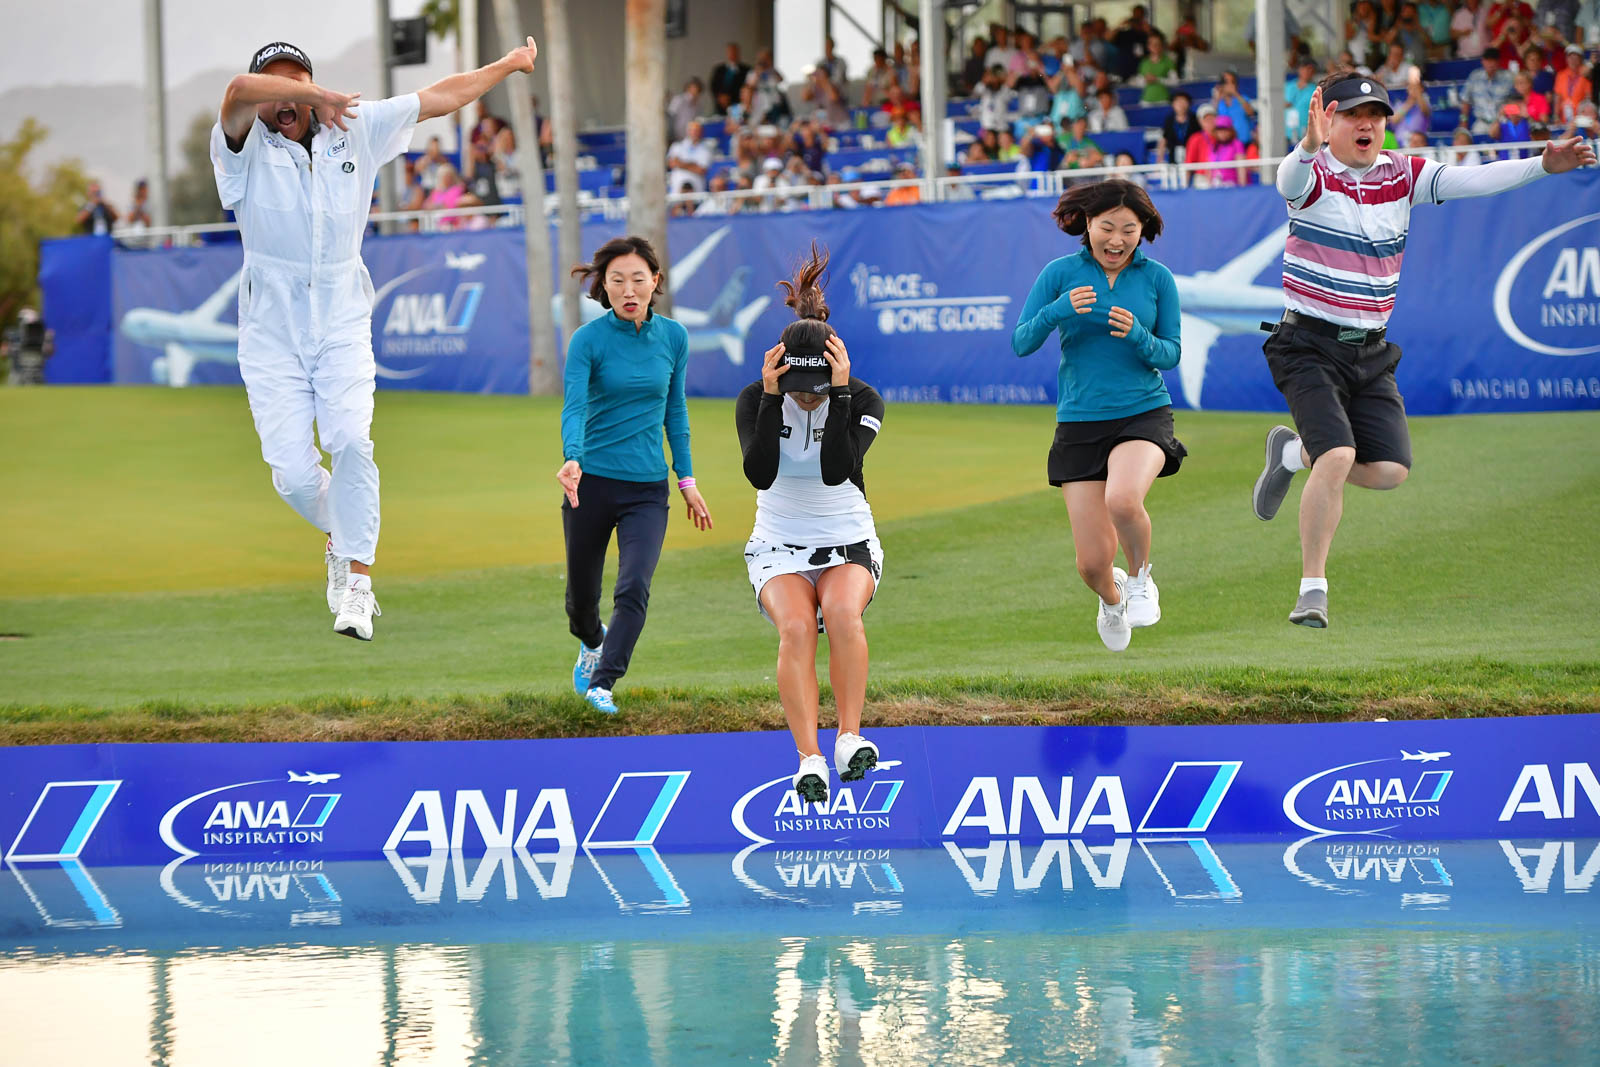 So Yeon Ryu - 2017 ANA Inspiration Champion